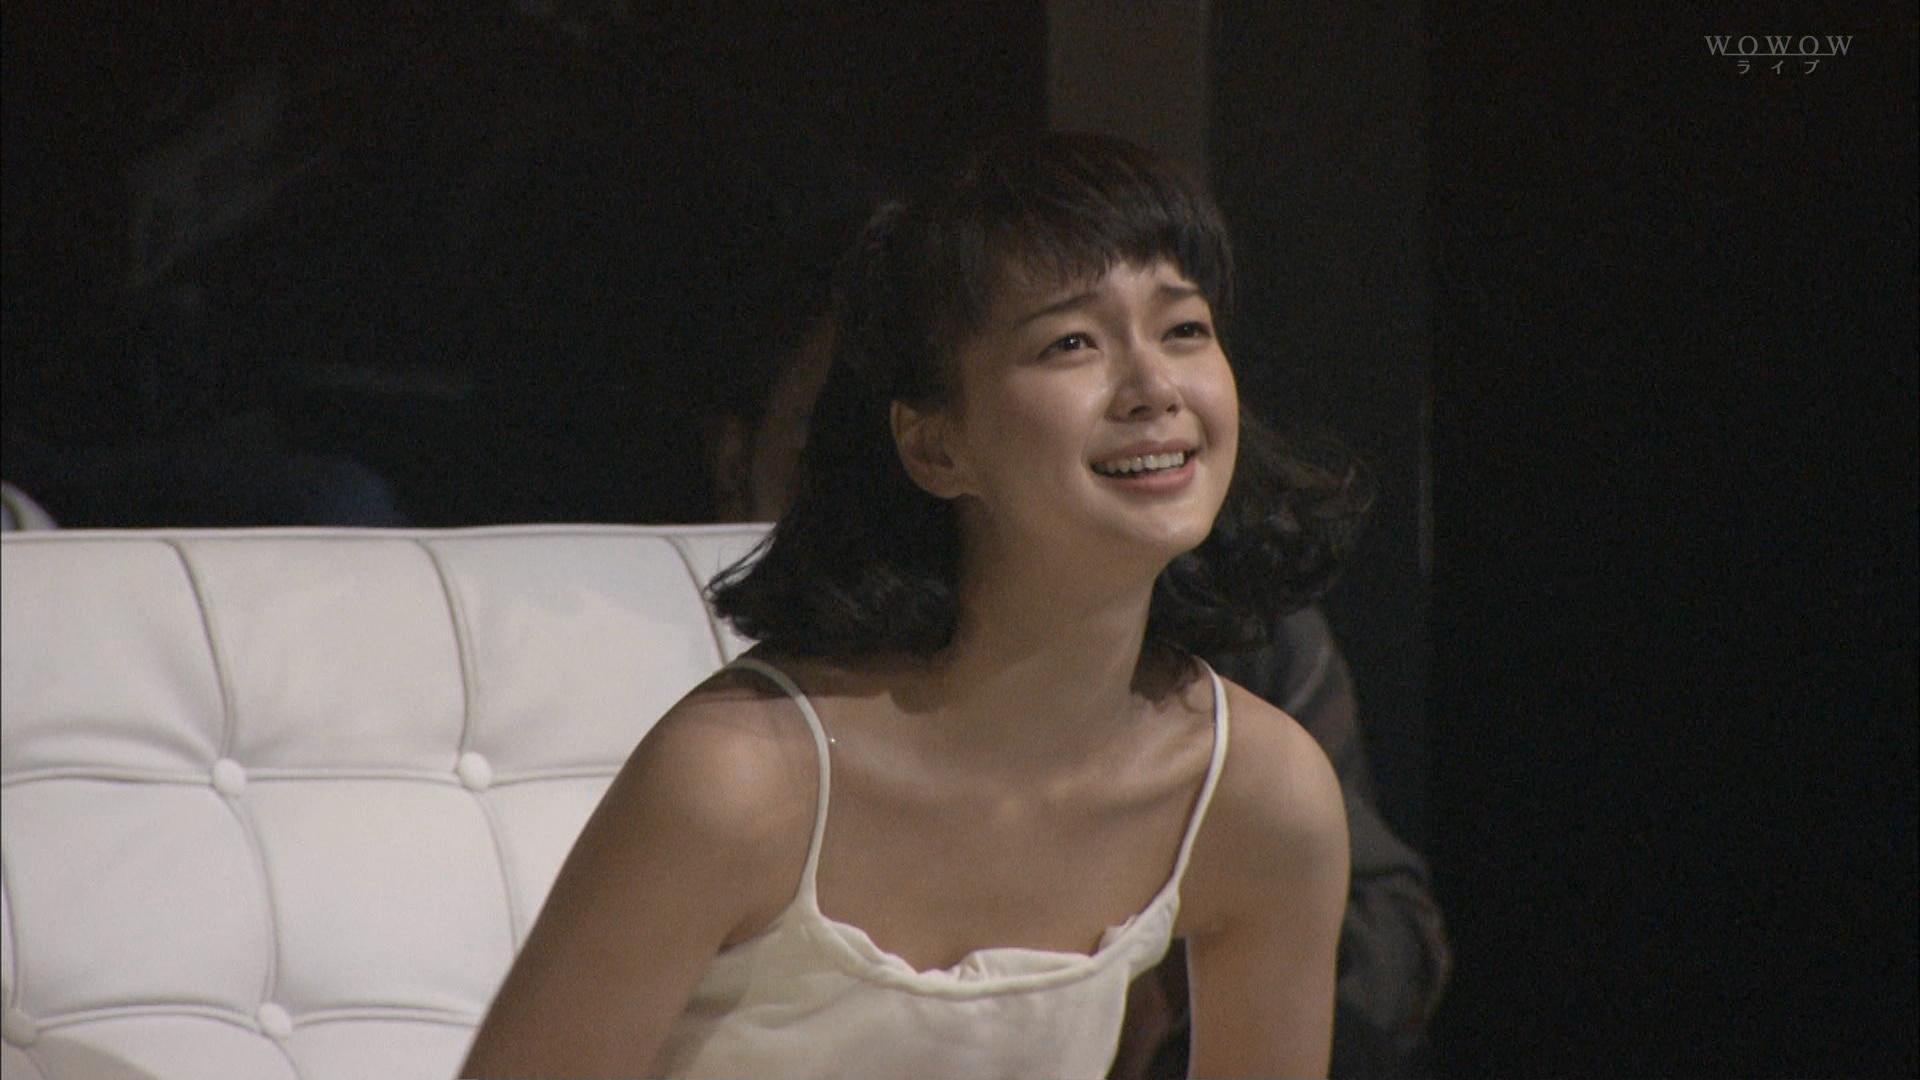 mikako tabe and haruma miura dating